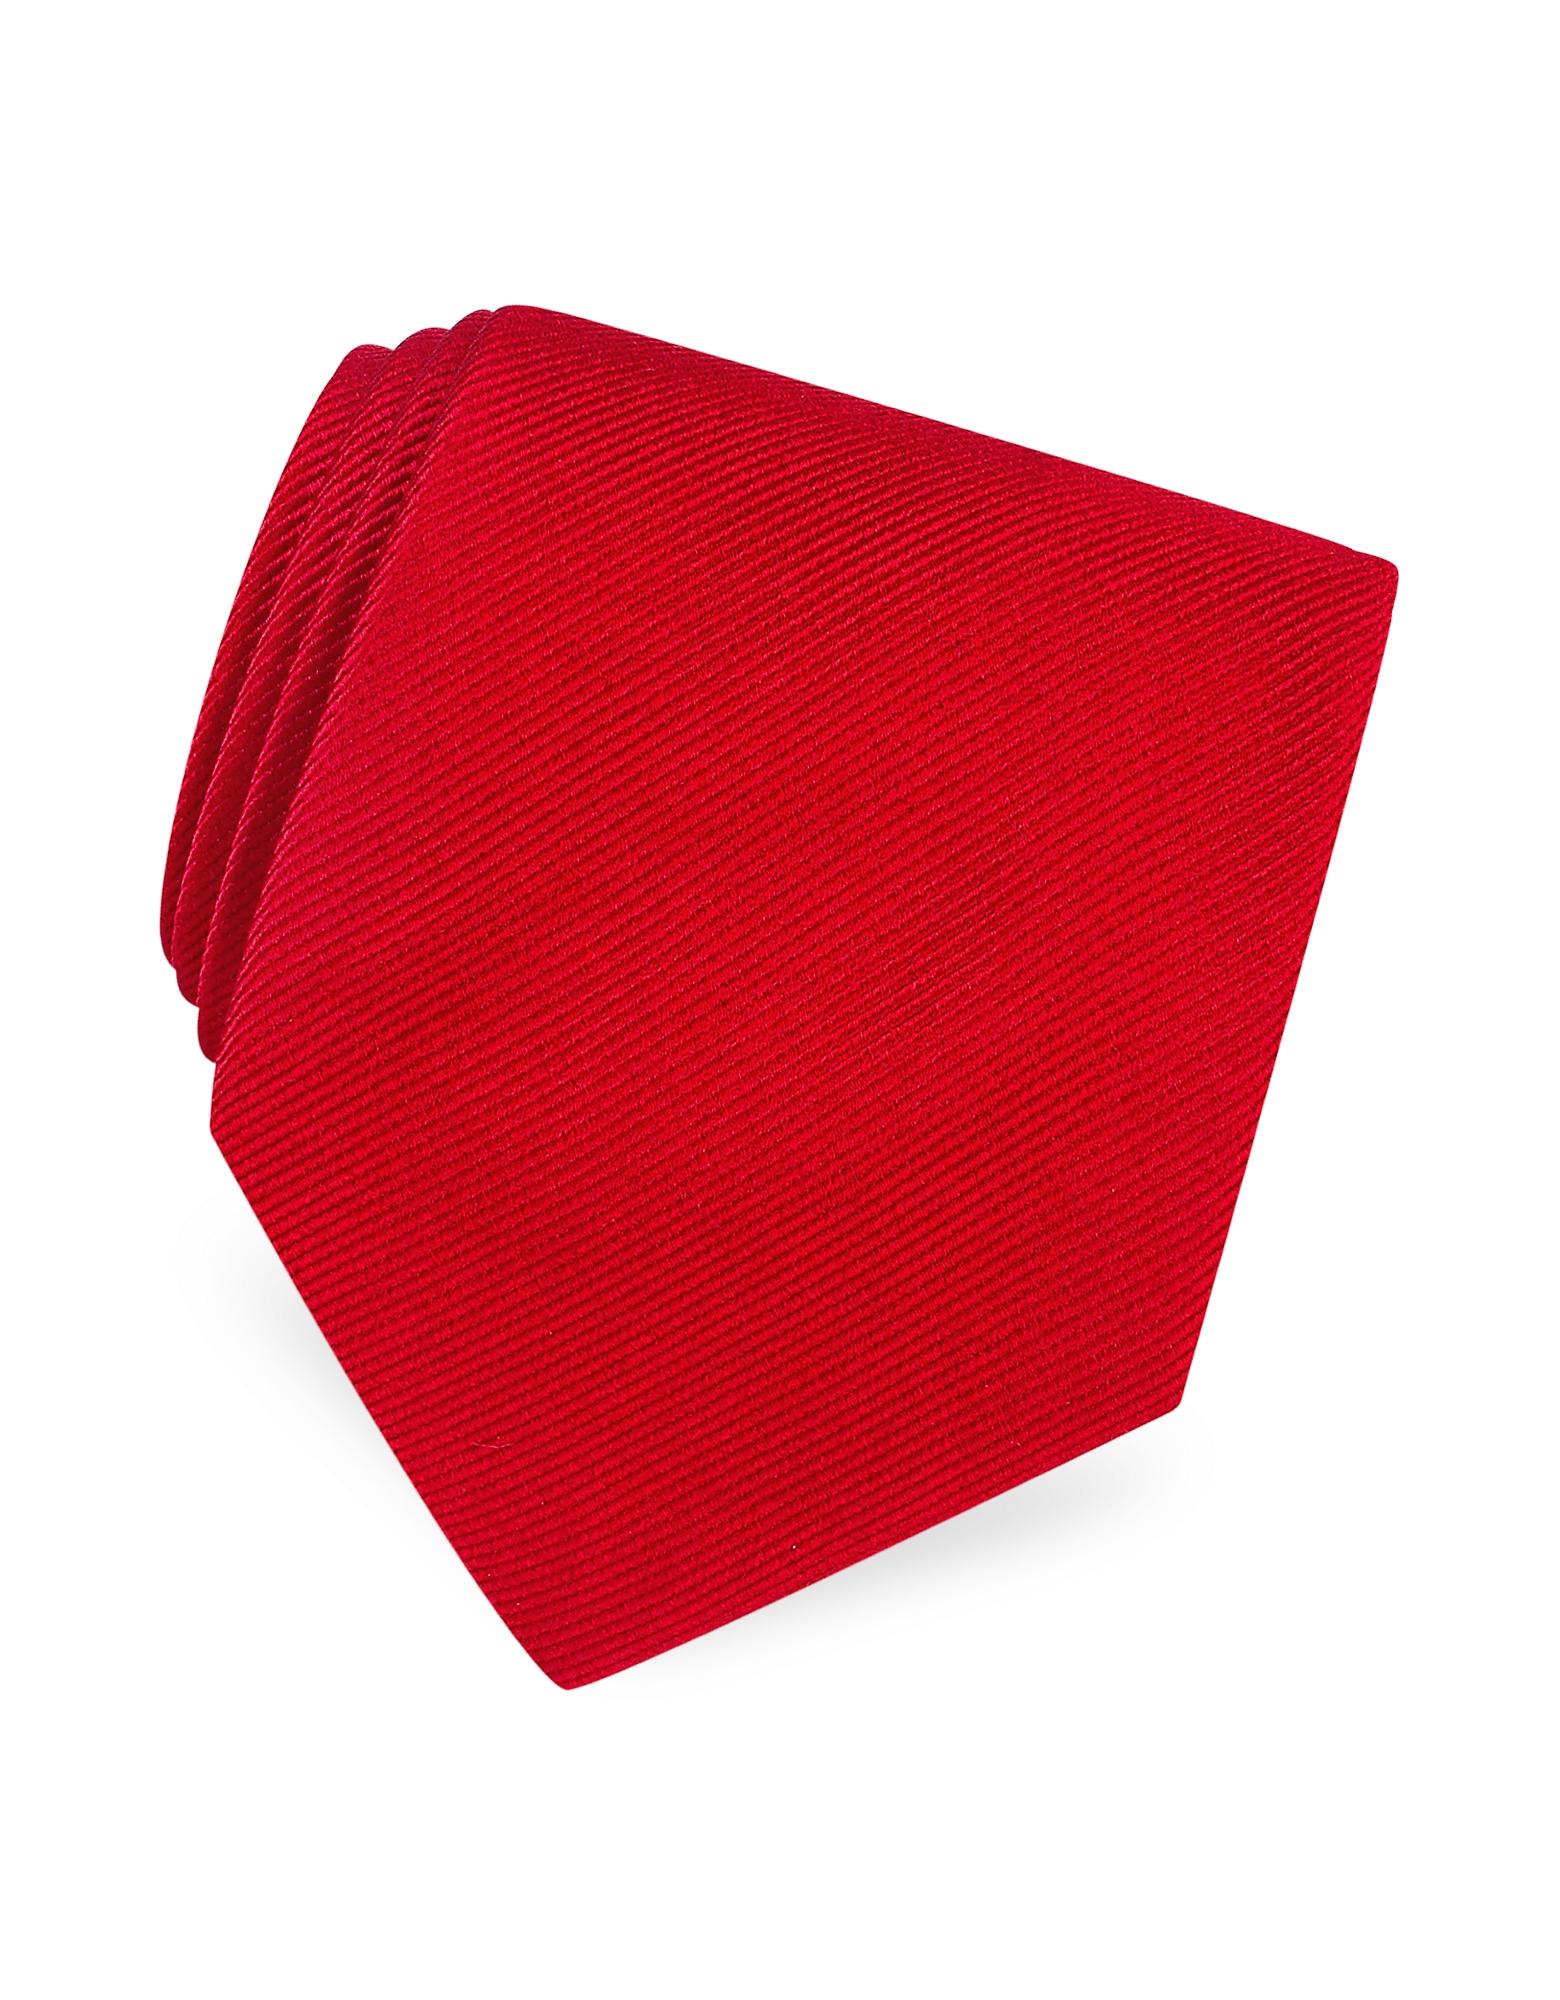 Forzieri Ties, Solid Twill Silk Tie